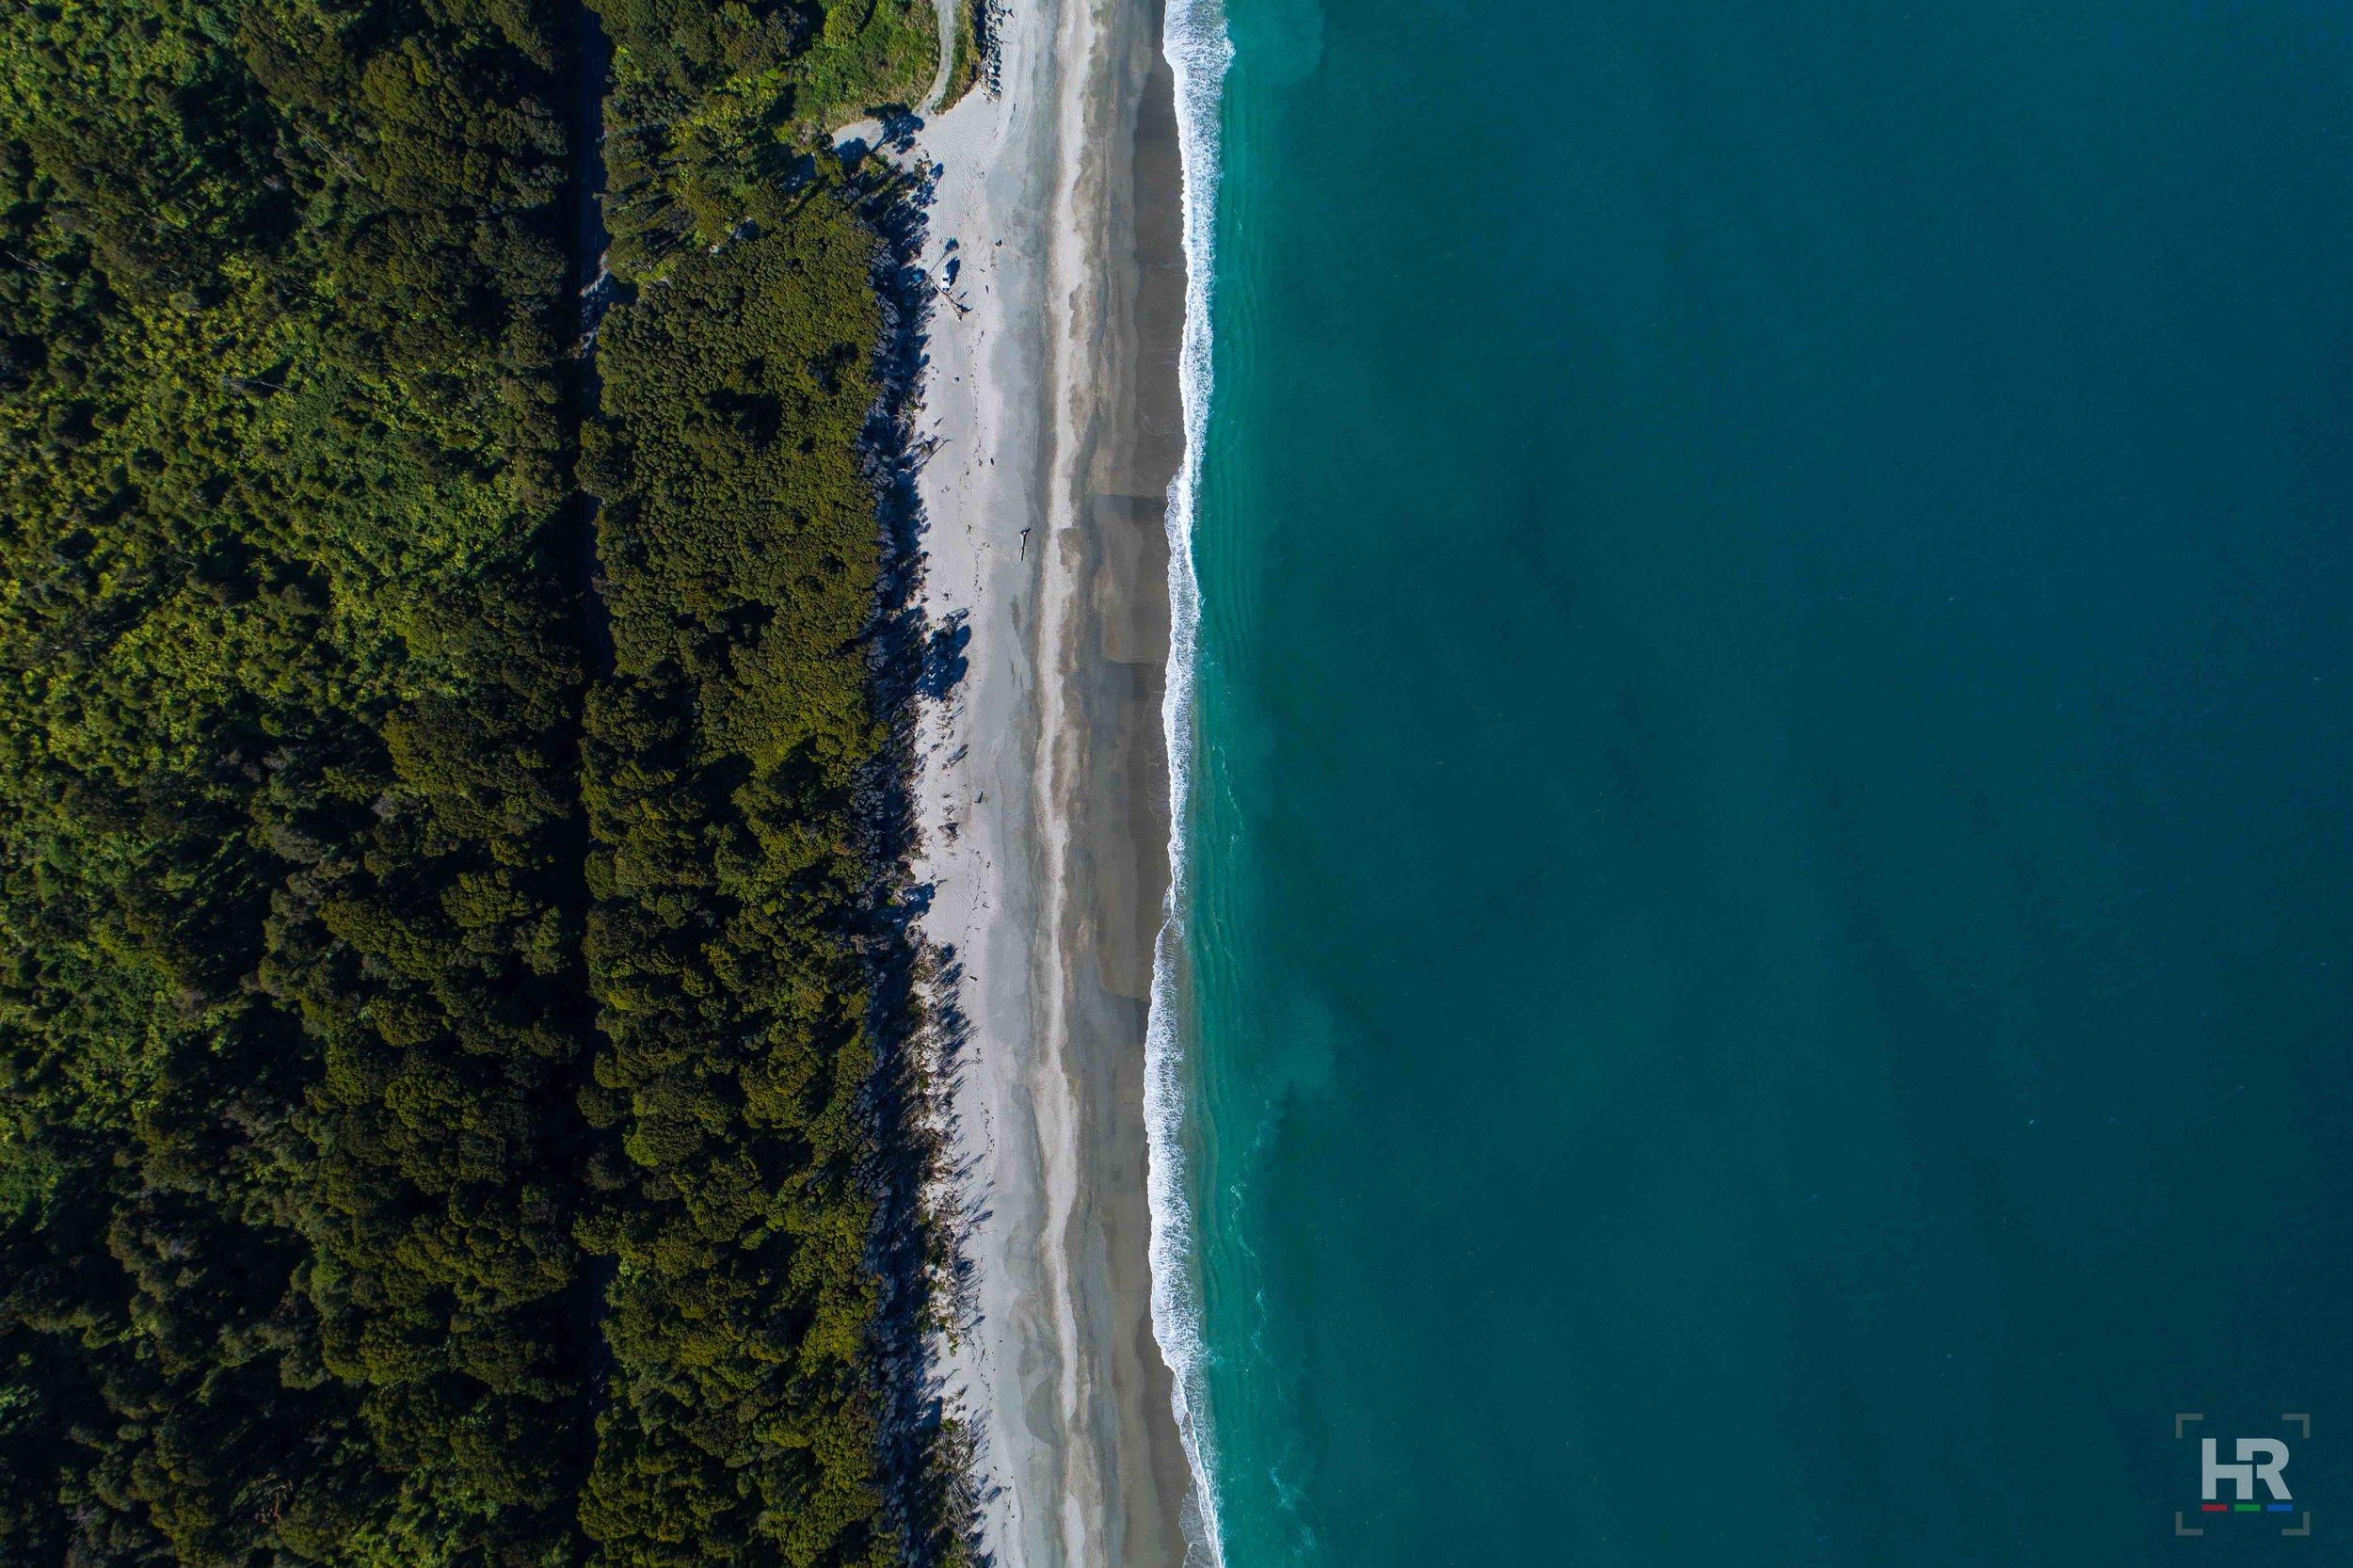 haast beach 10 site.jpg